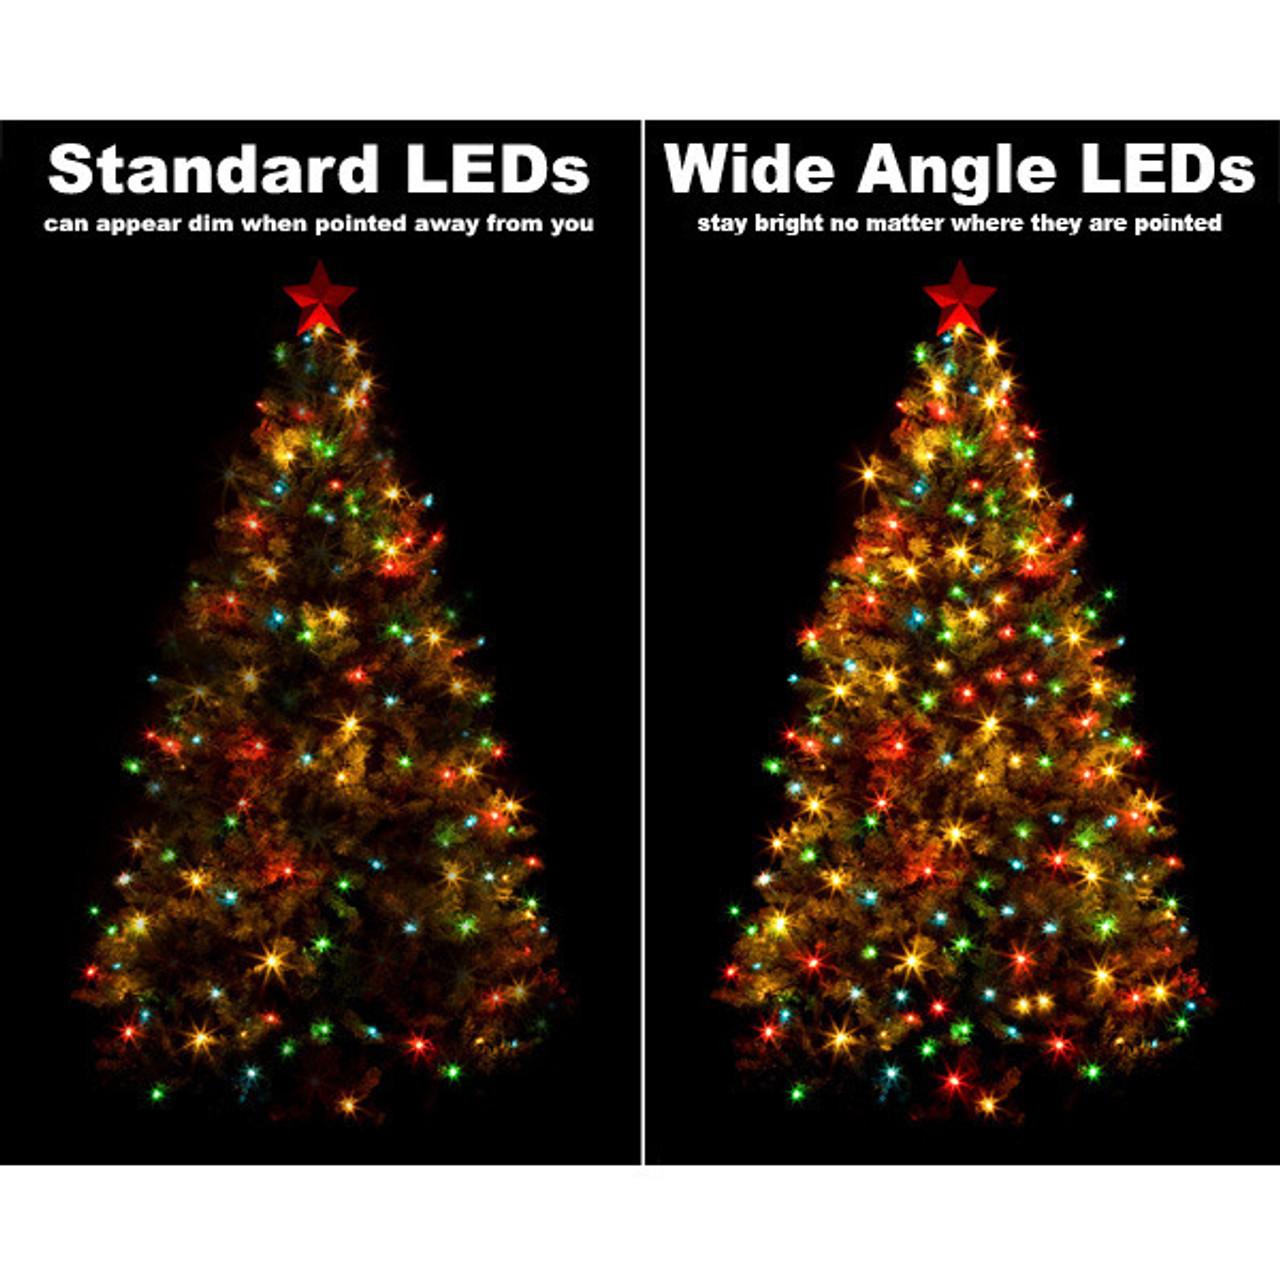 25 Ft Cool White String Lights Led 5mm Wide Angle 50 Leds